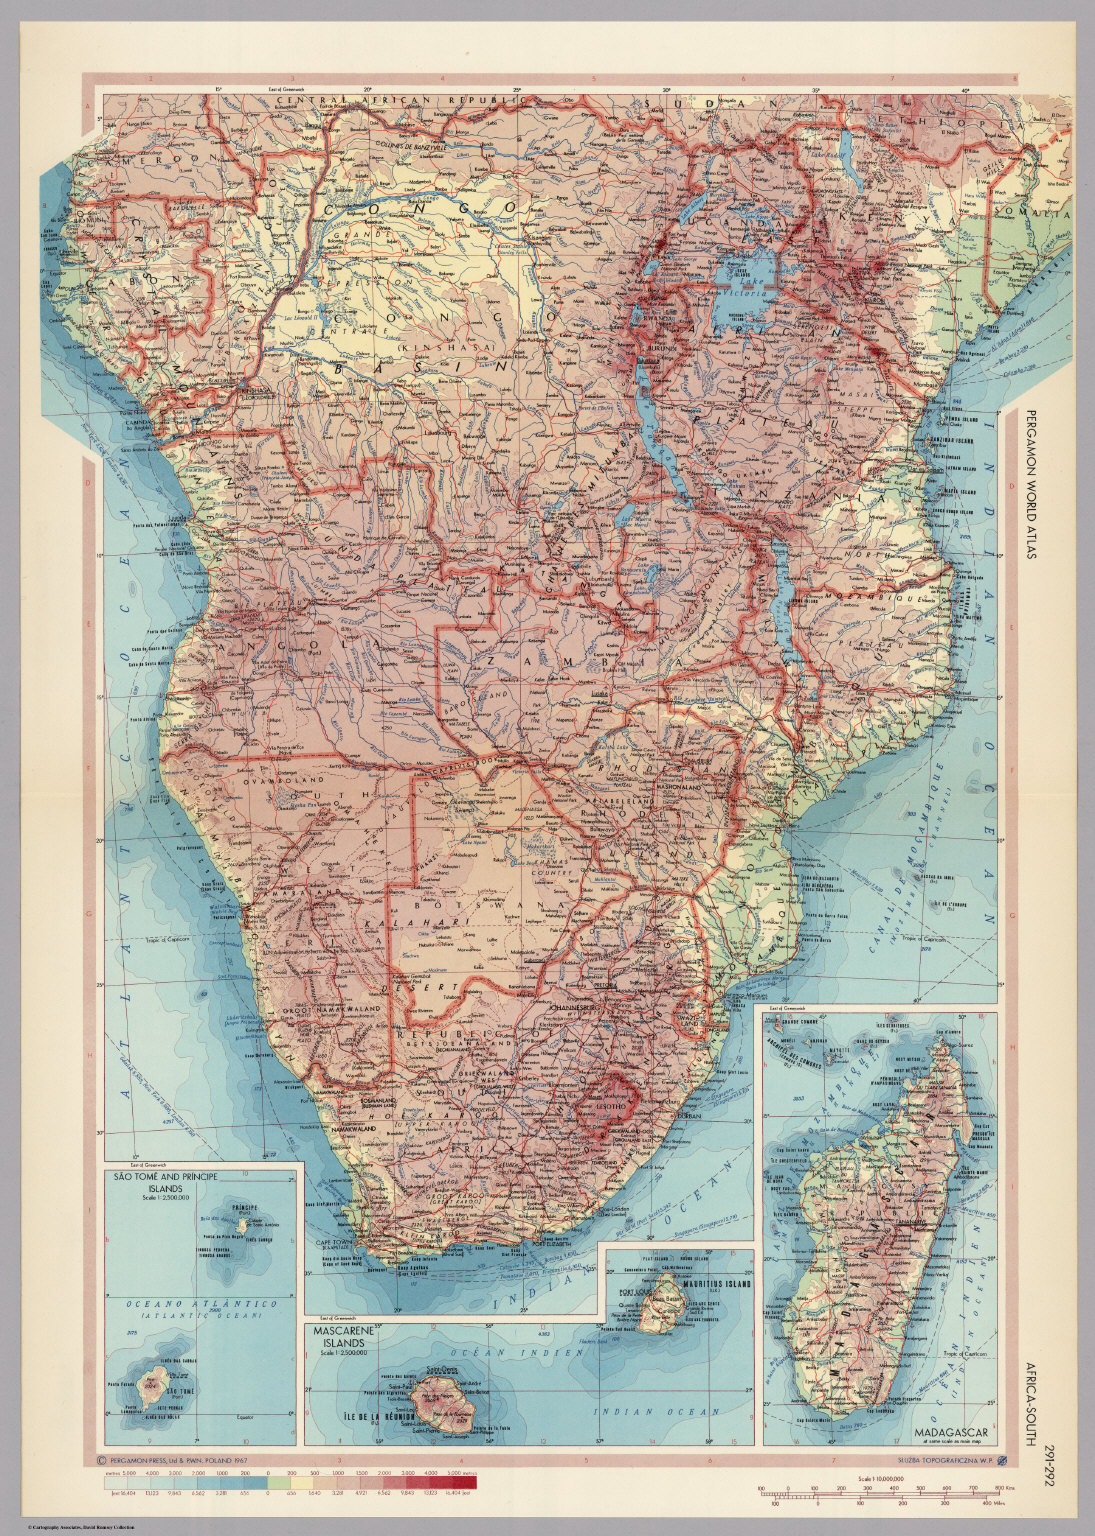 Africa south pergamon world atlas david rumsey historical map pergamon world atlas gumiabroncs Gallery